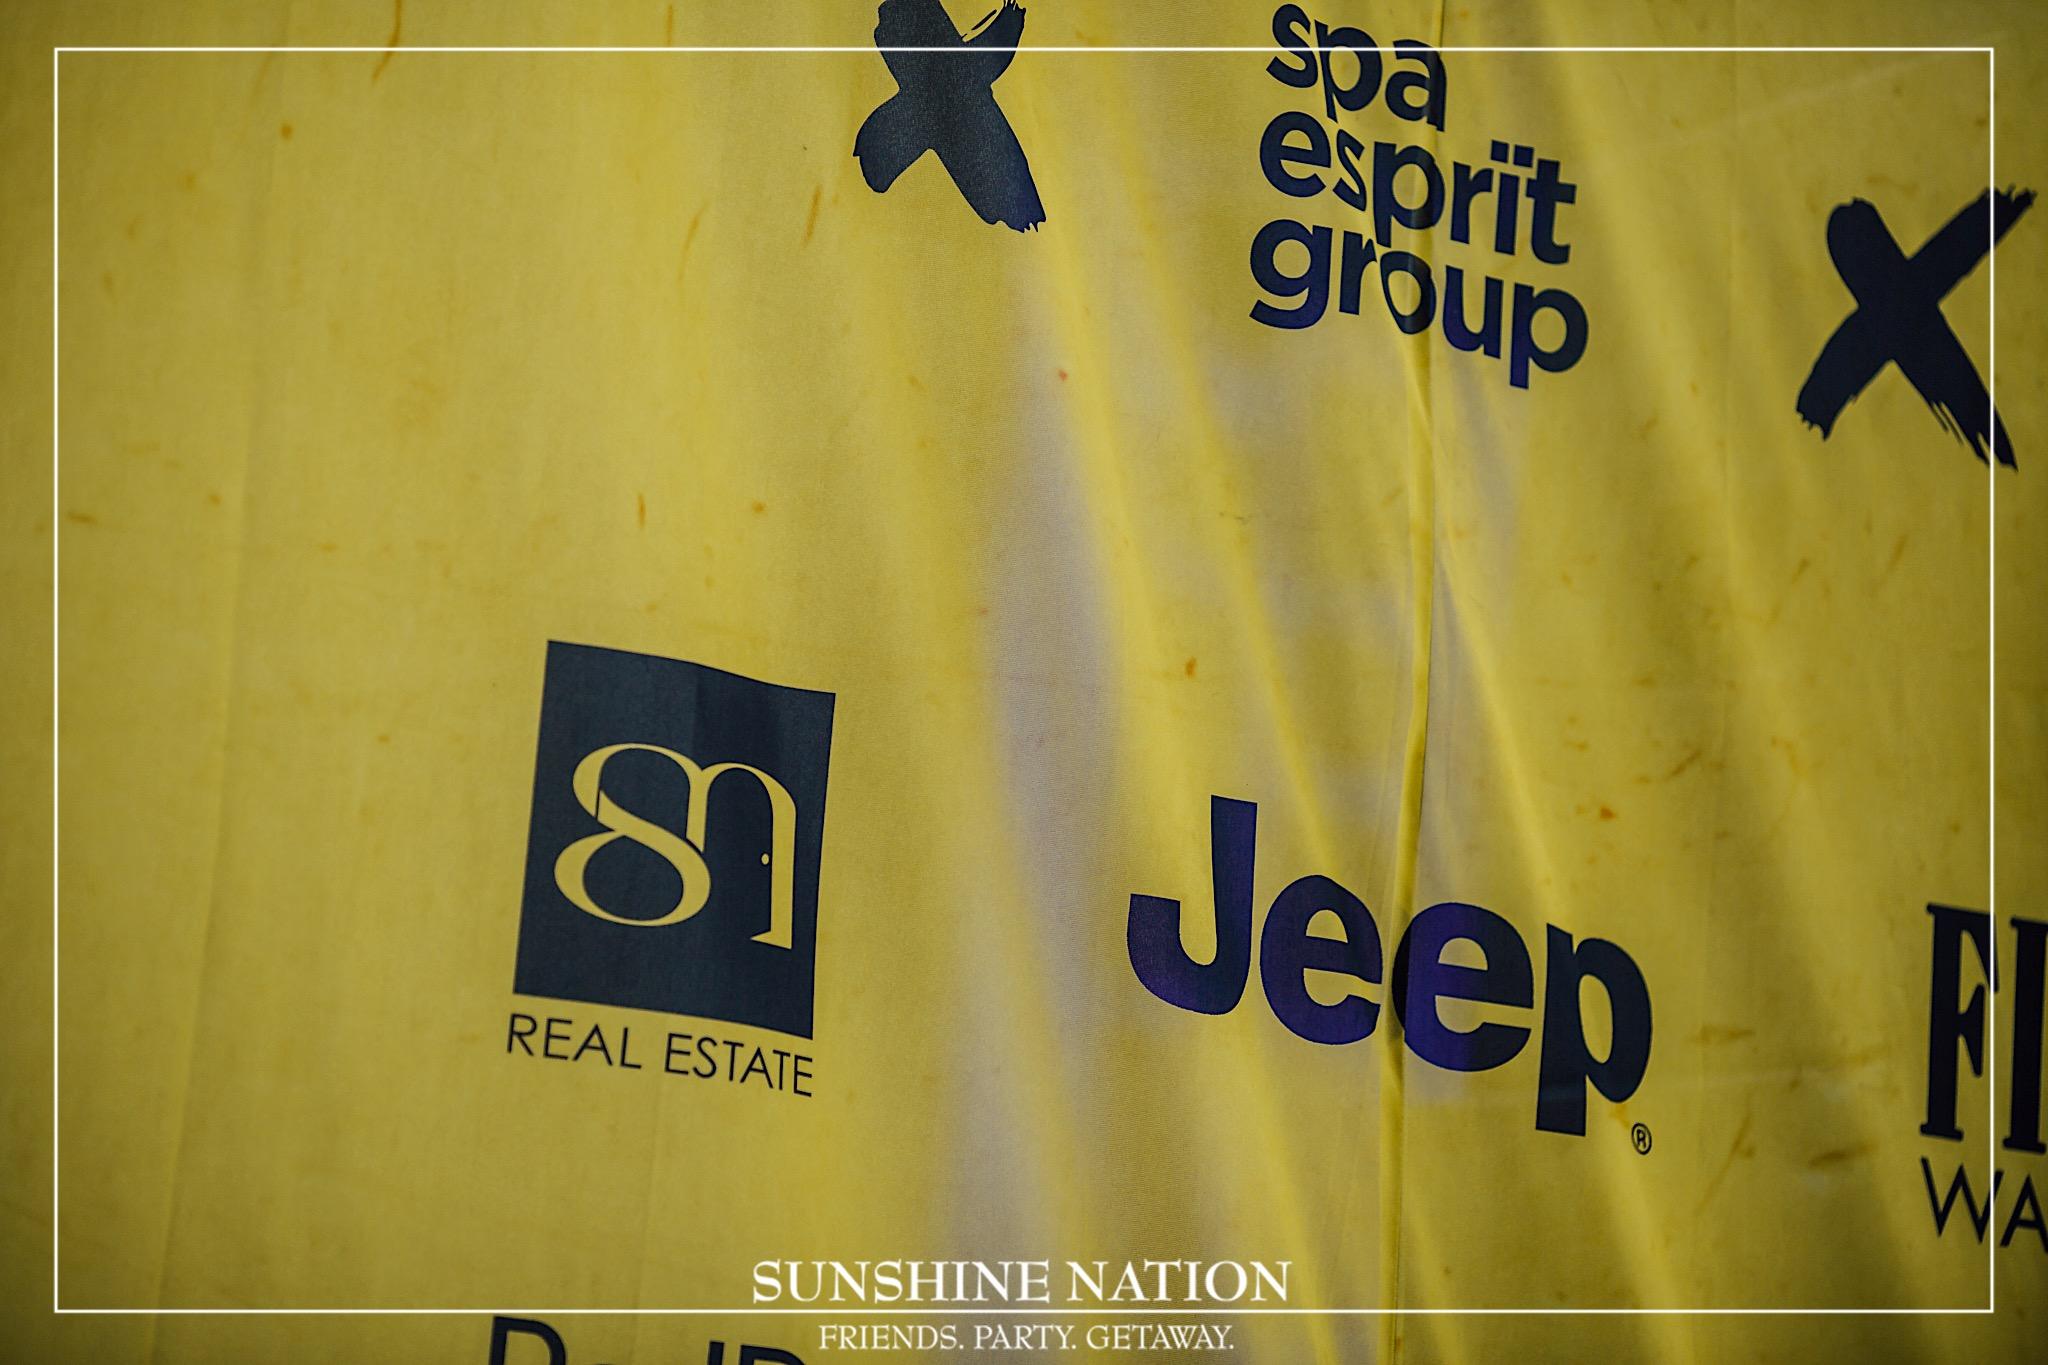 20112016_SunshineNation_Colossal007_Watermarked.jpg